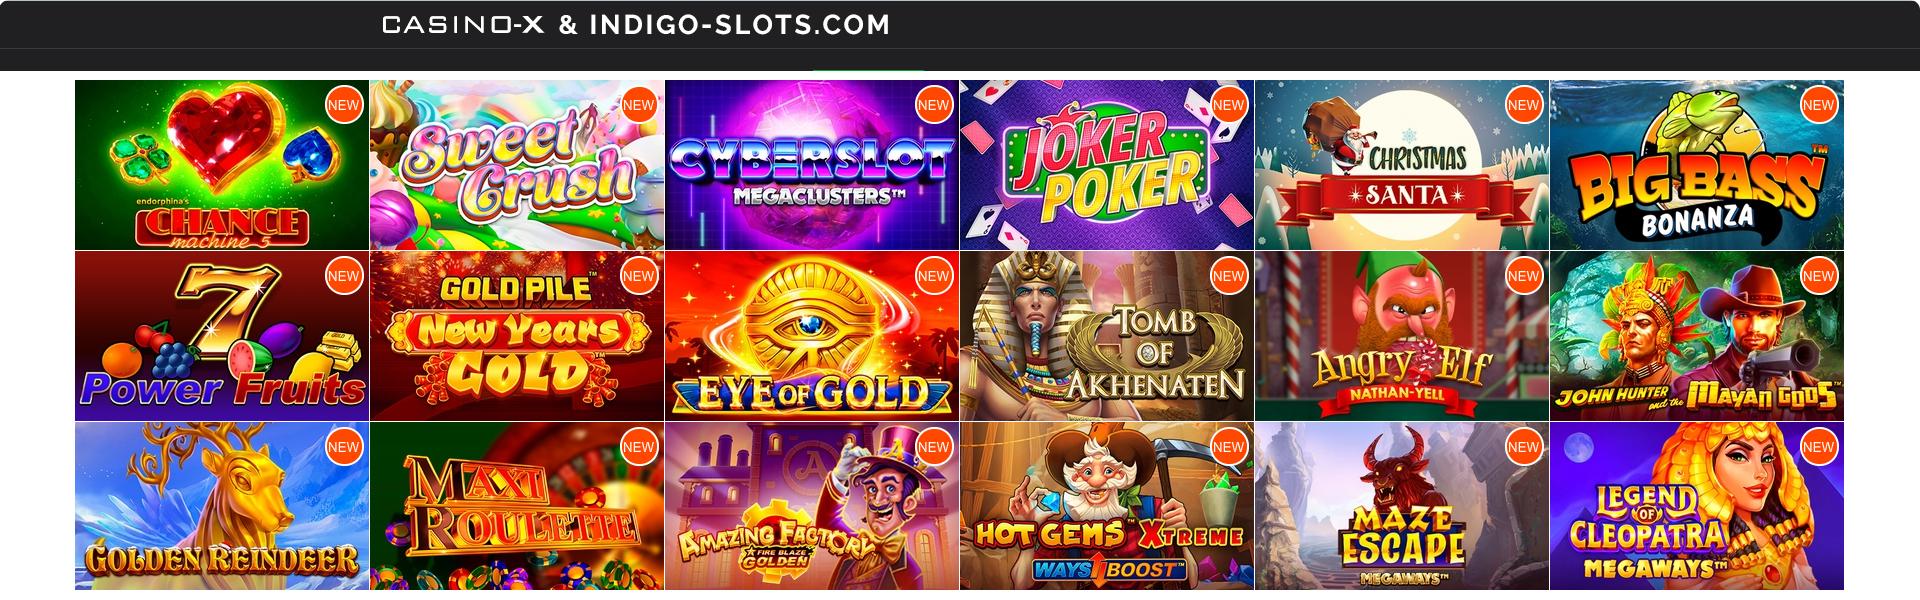 Casino-x games.